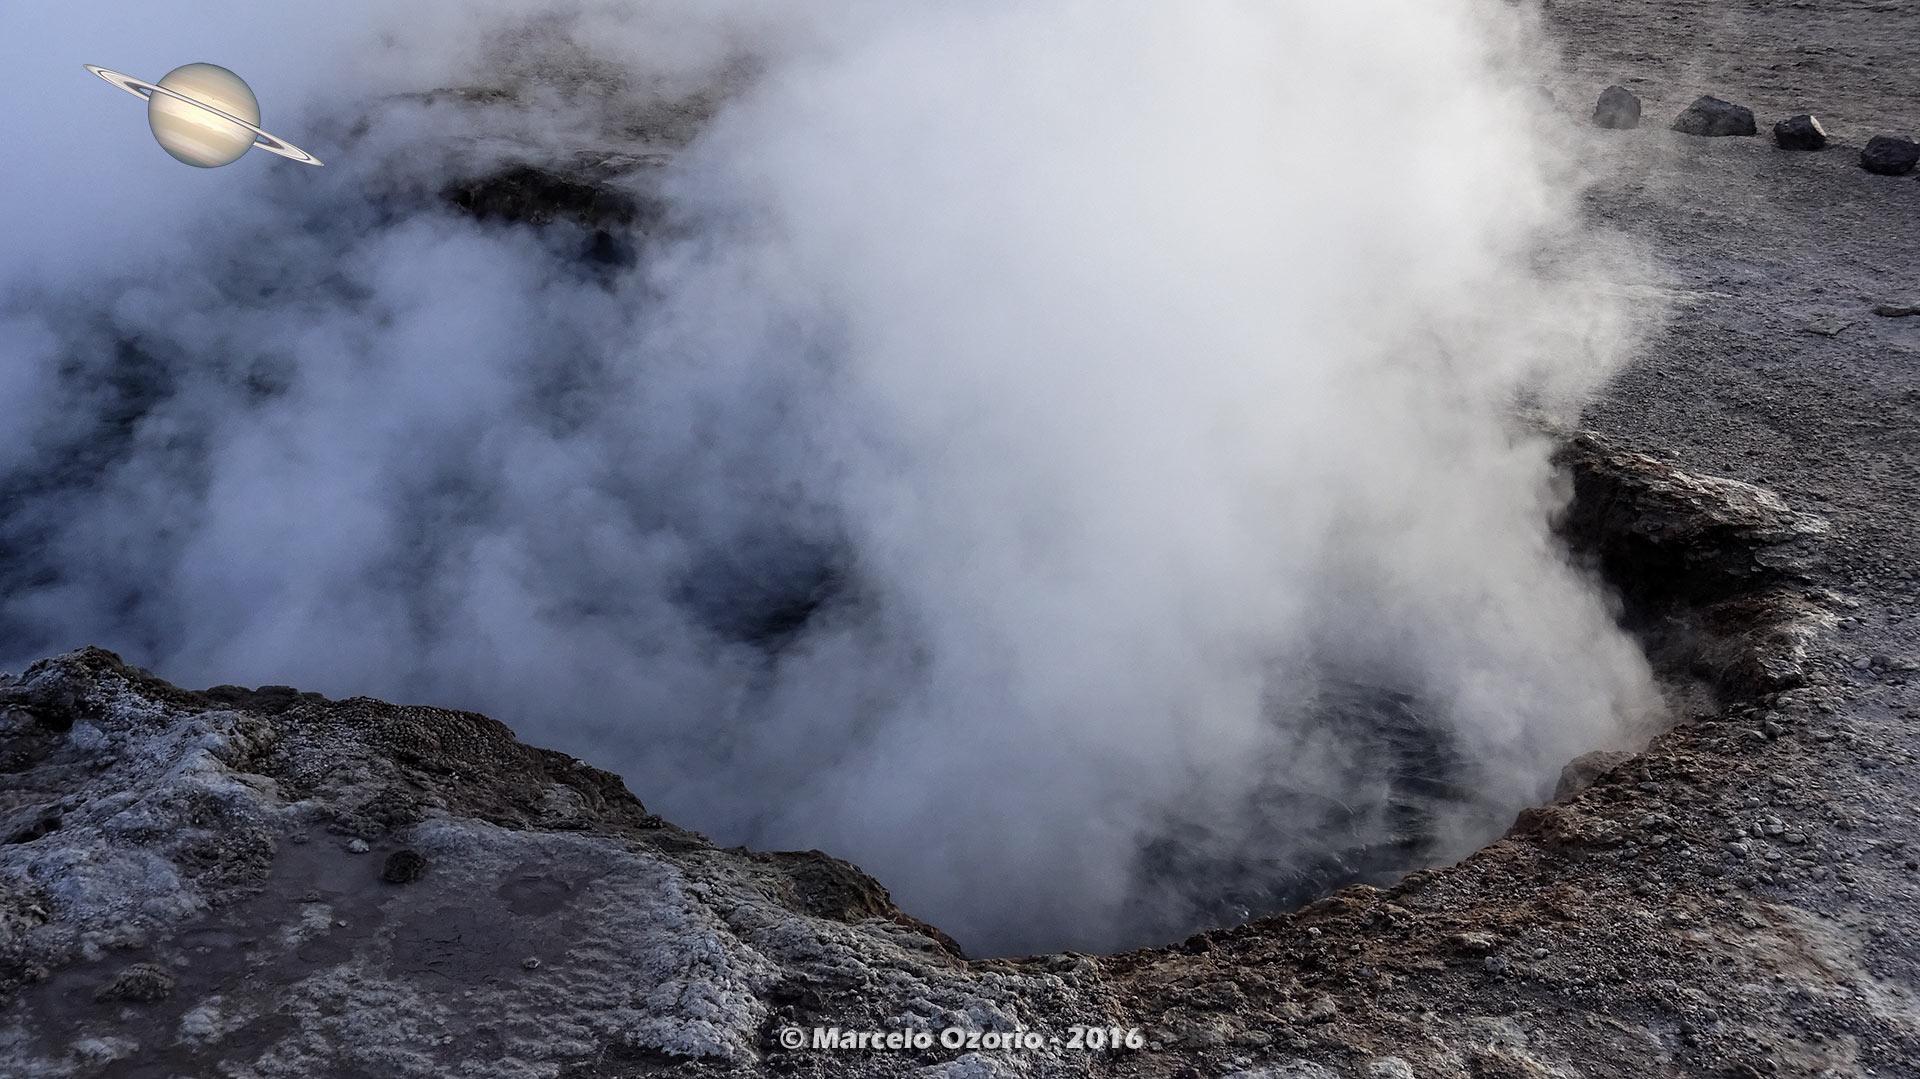 el tatio geysers atacama desert 11 - Os Surreais Gêiseres El Tatio - Deserto do Atacama - Chile